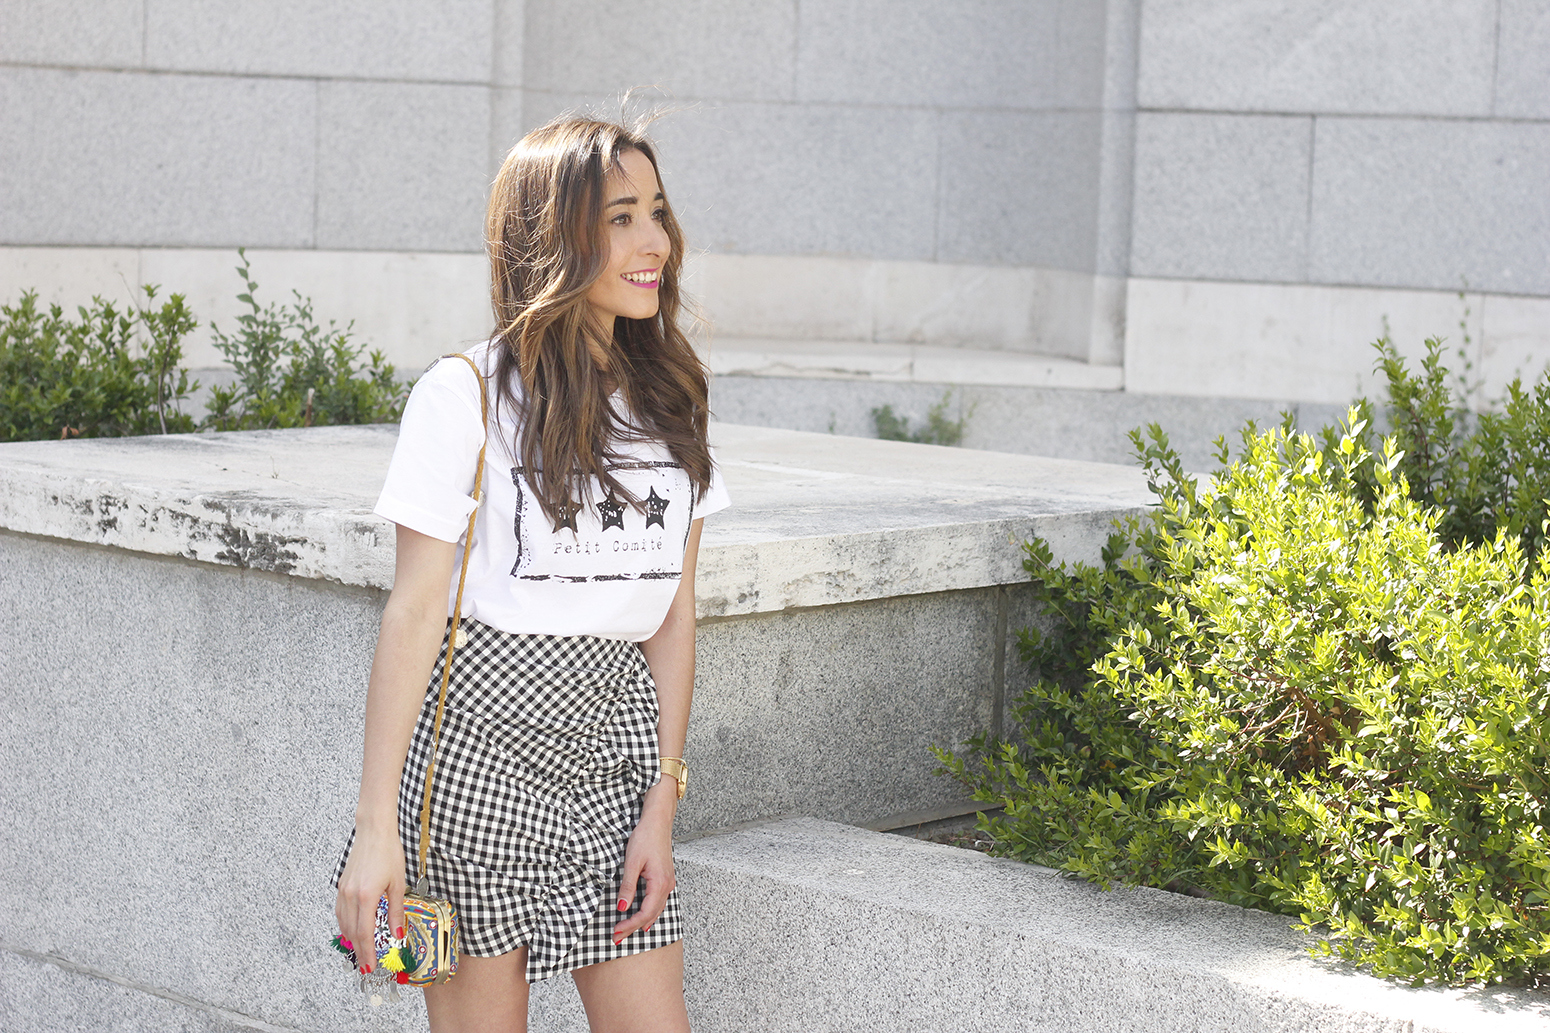 vichy skirt white t-shirt carolina herrera pink heels outfit style fashion summer09